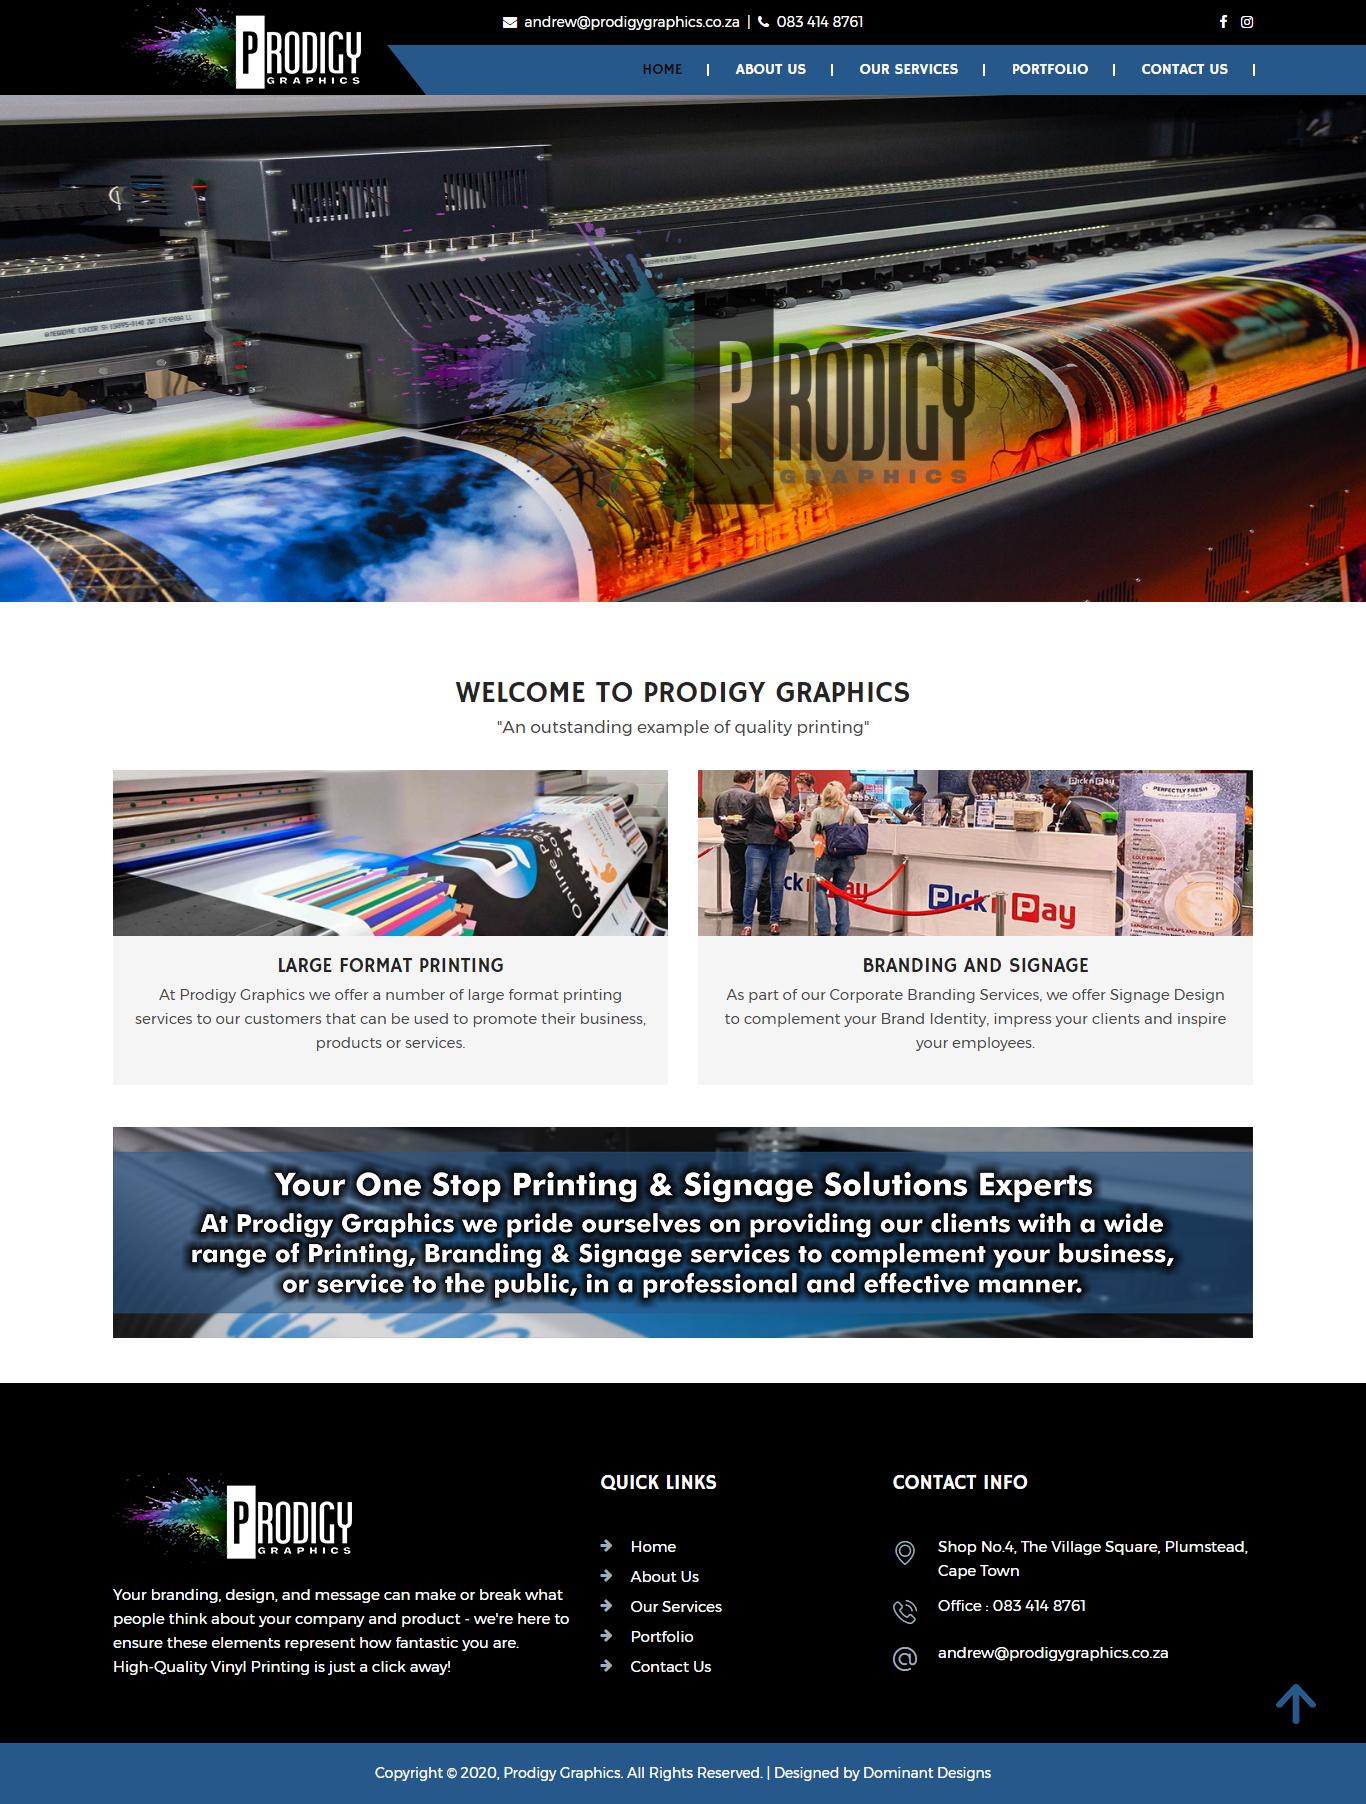 Prodigy Graphics Website Design